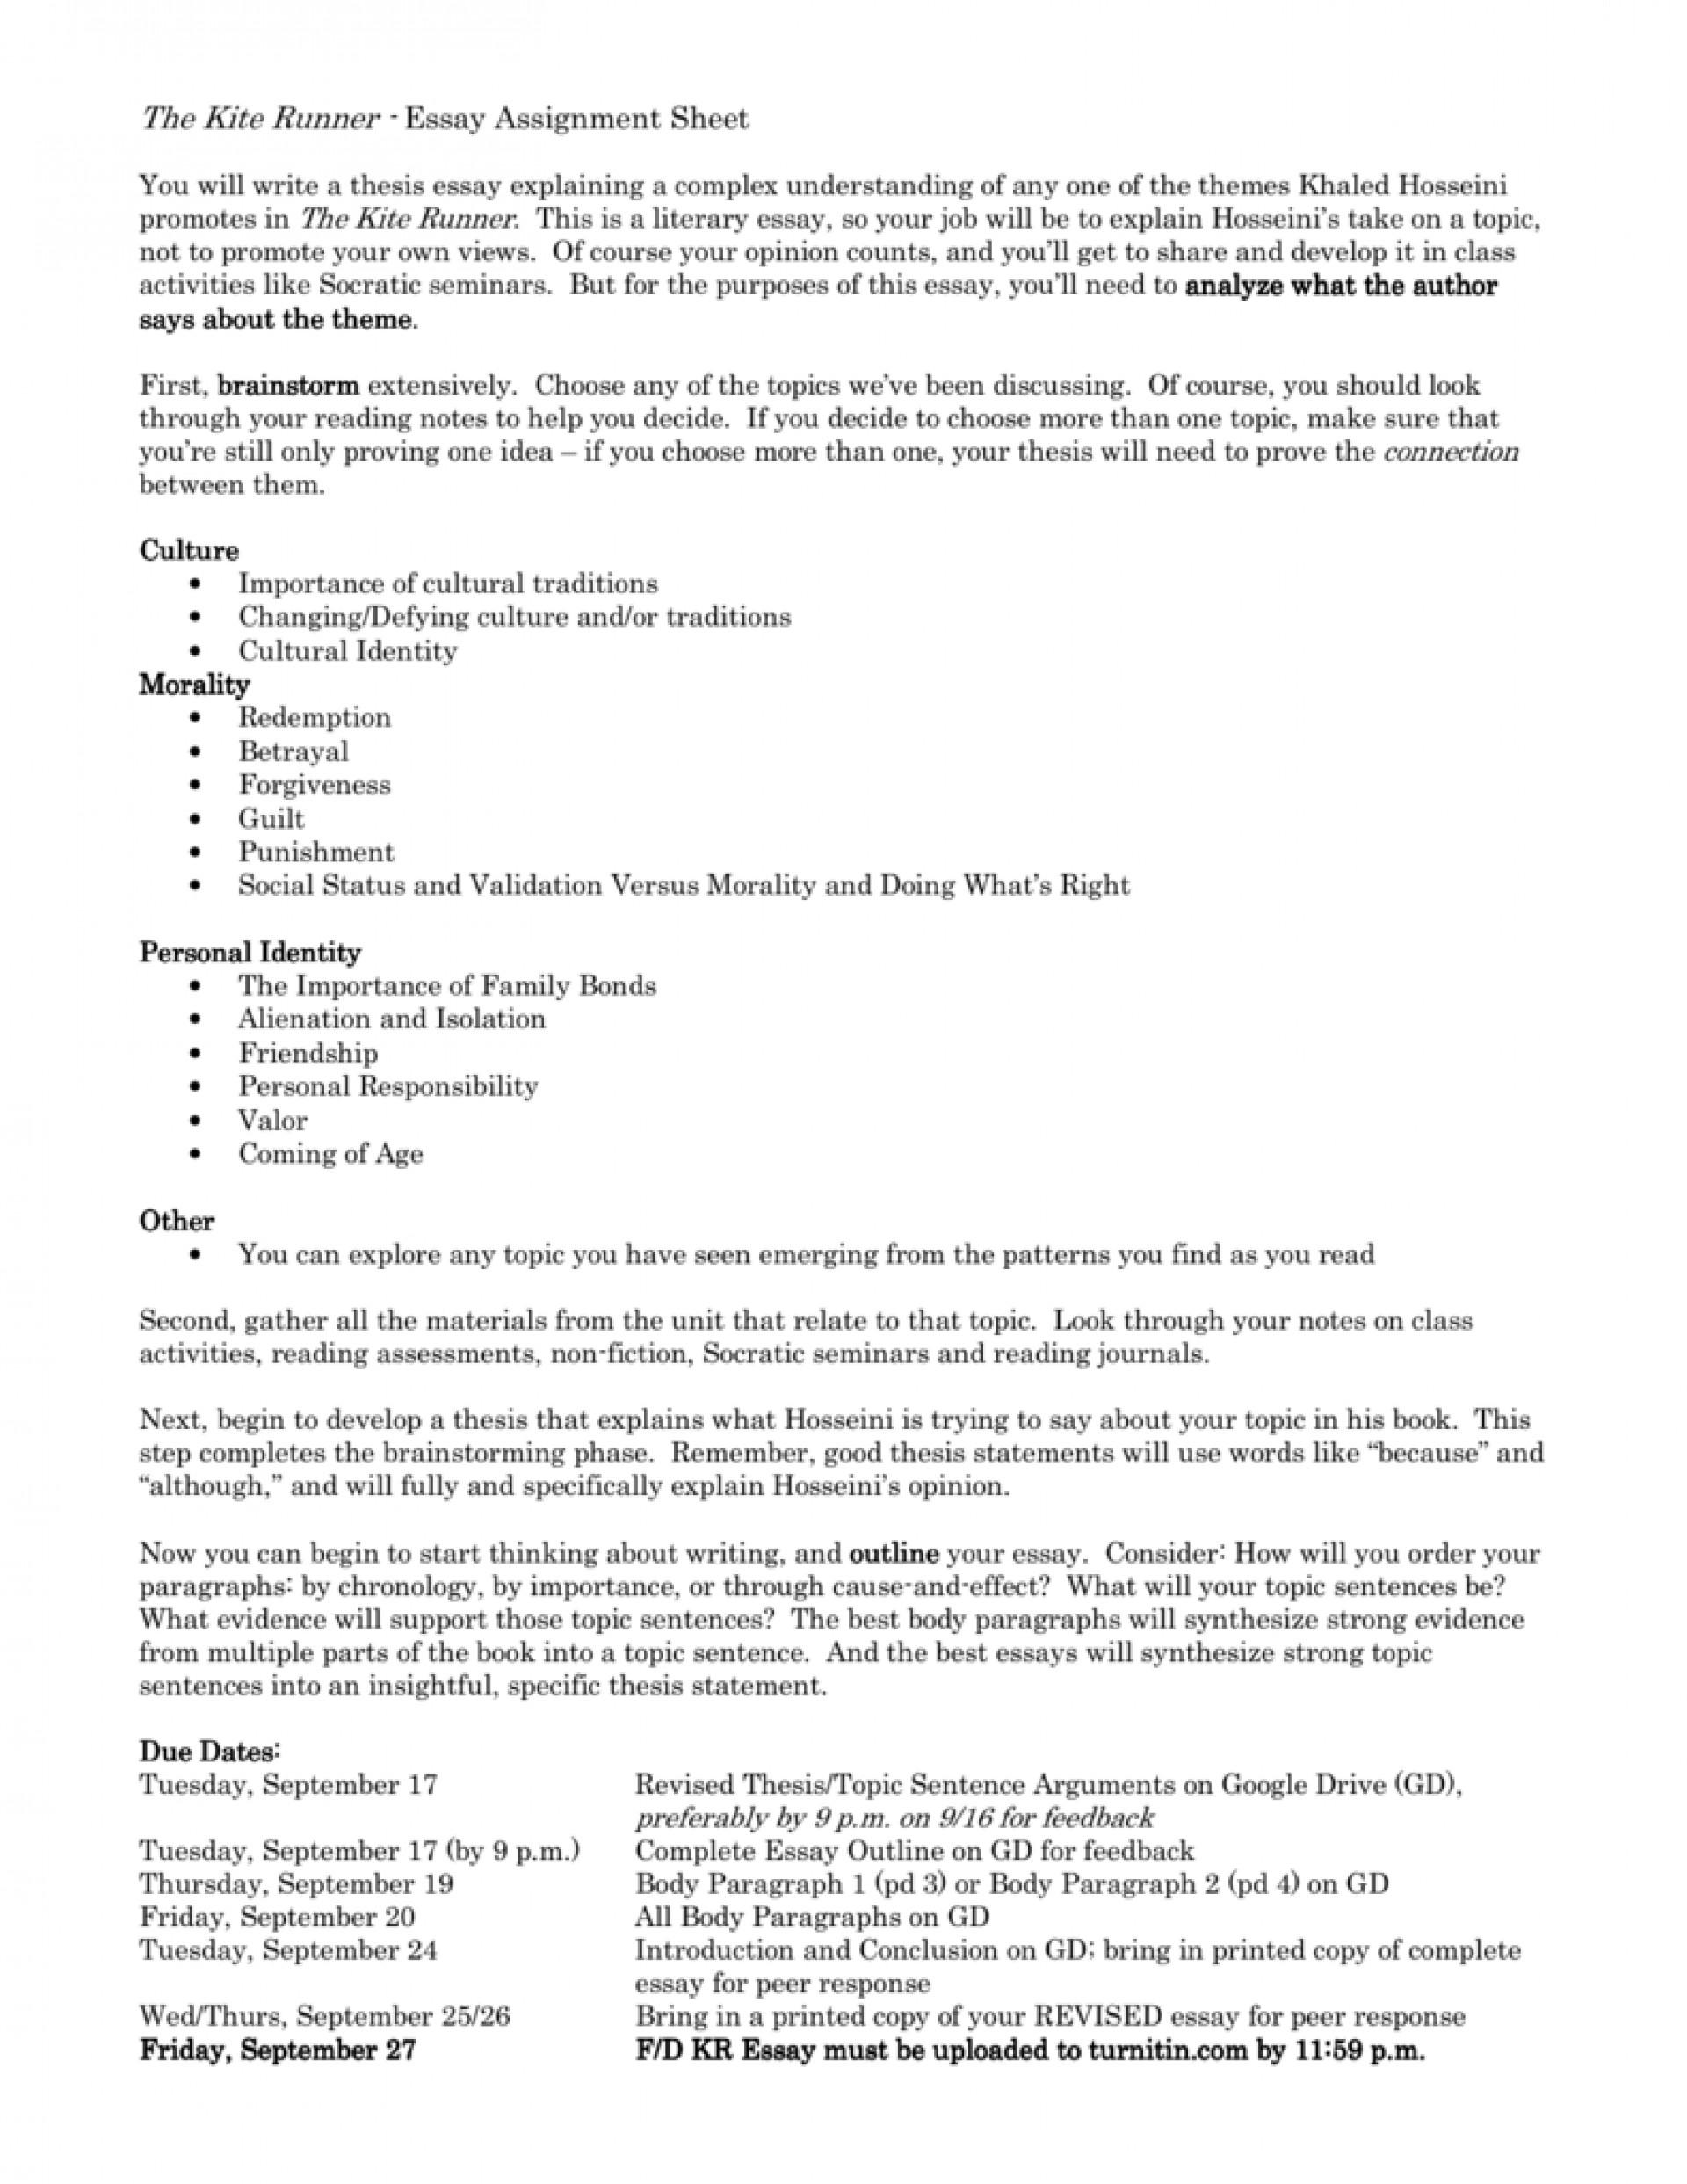 008 Age Of Responsibility Essay Example 008368919 1 Awful Persuasive Argumentative Criminal 1920